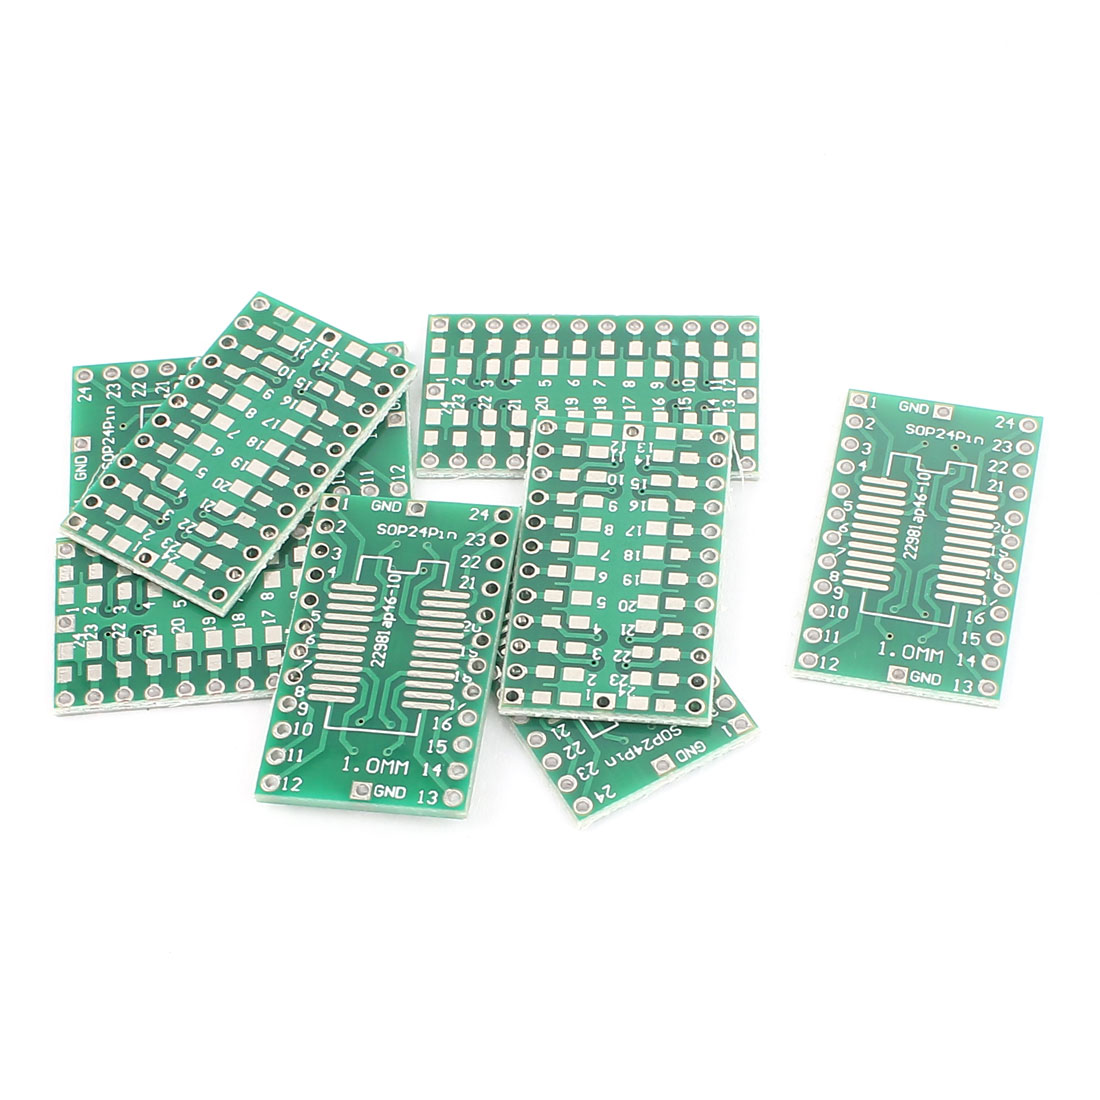 8 Pcs 30mm x 18mm SOP 24Pins PCB One-sided Adapter Converter Board